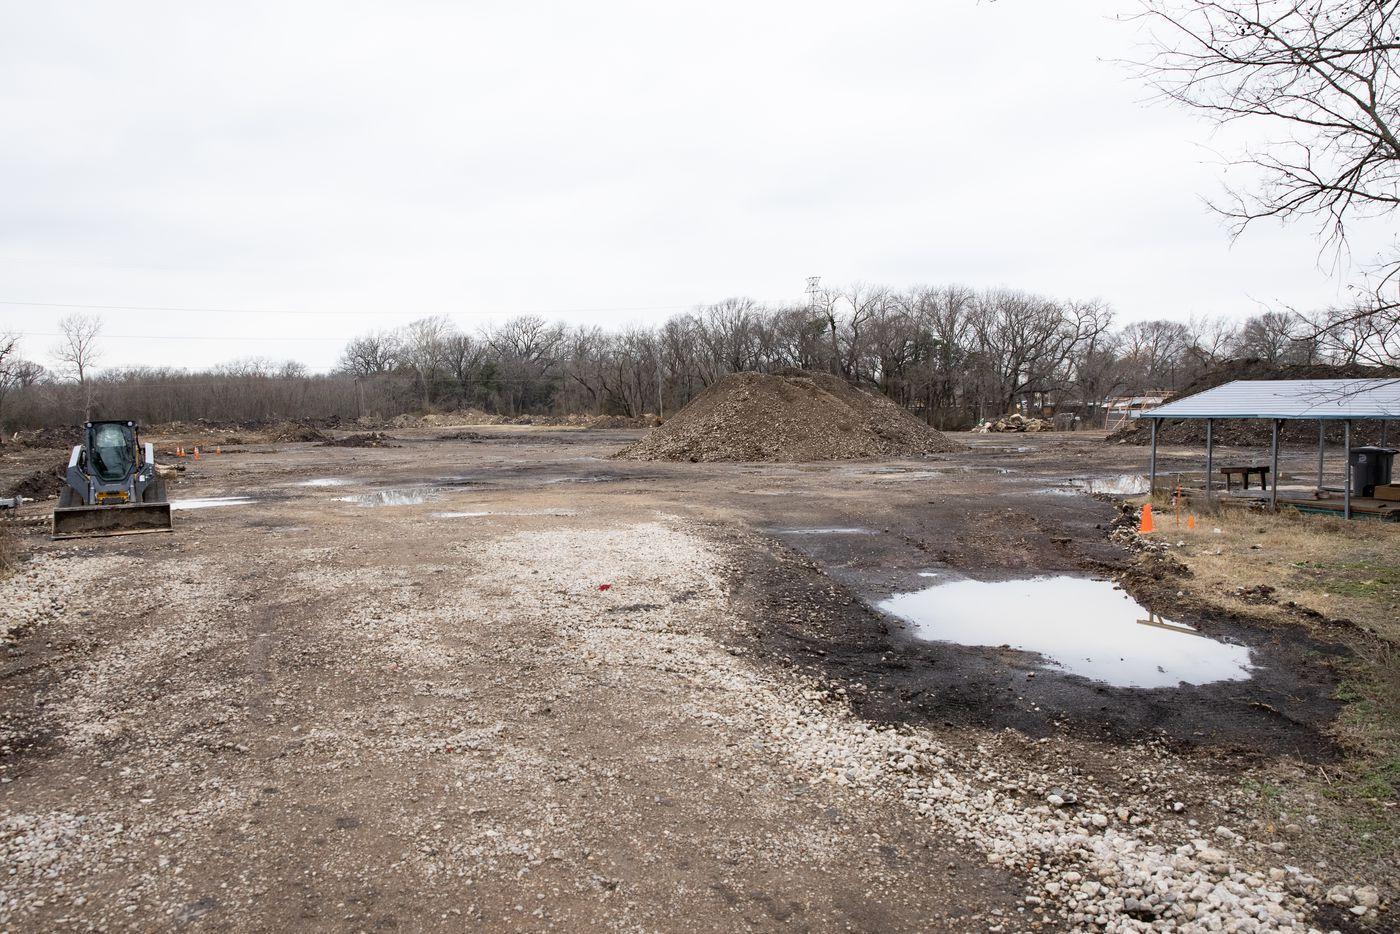 The empty lot where Shingle Mountain stood in Dallas on Friday, Feb. 26, 2021. (Juan Figueroa/ The Dallas Morning News)